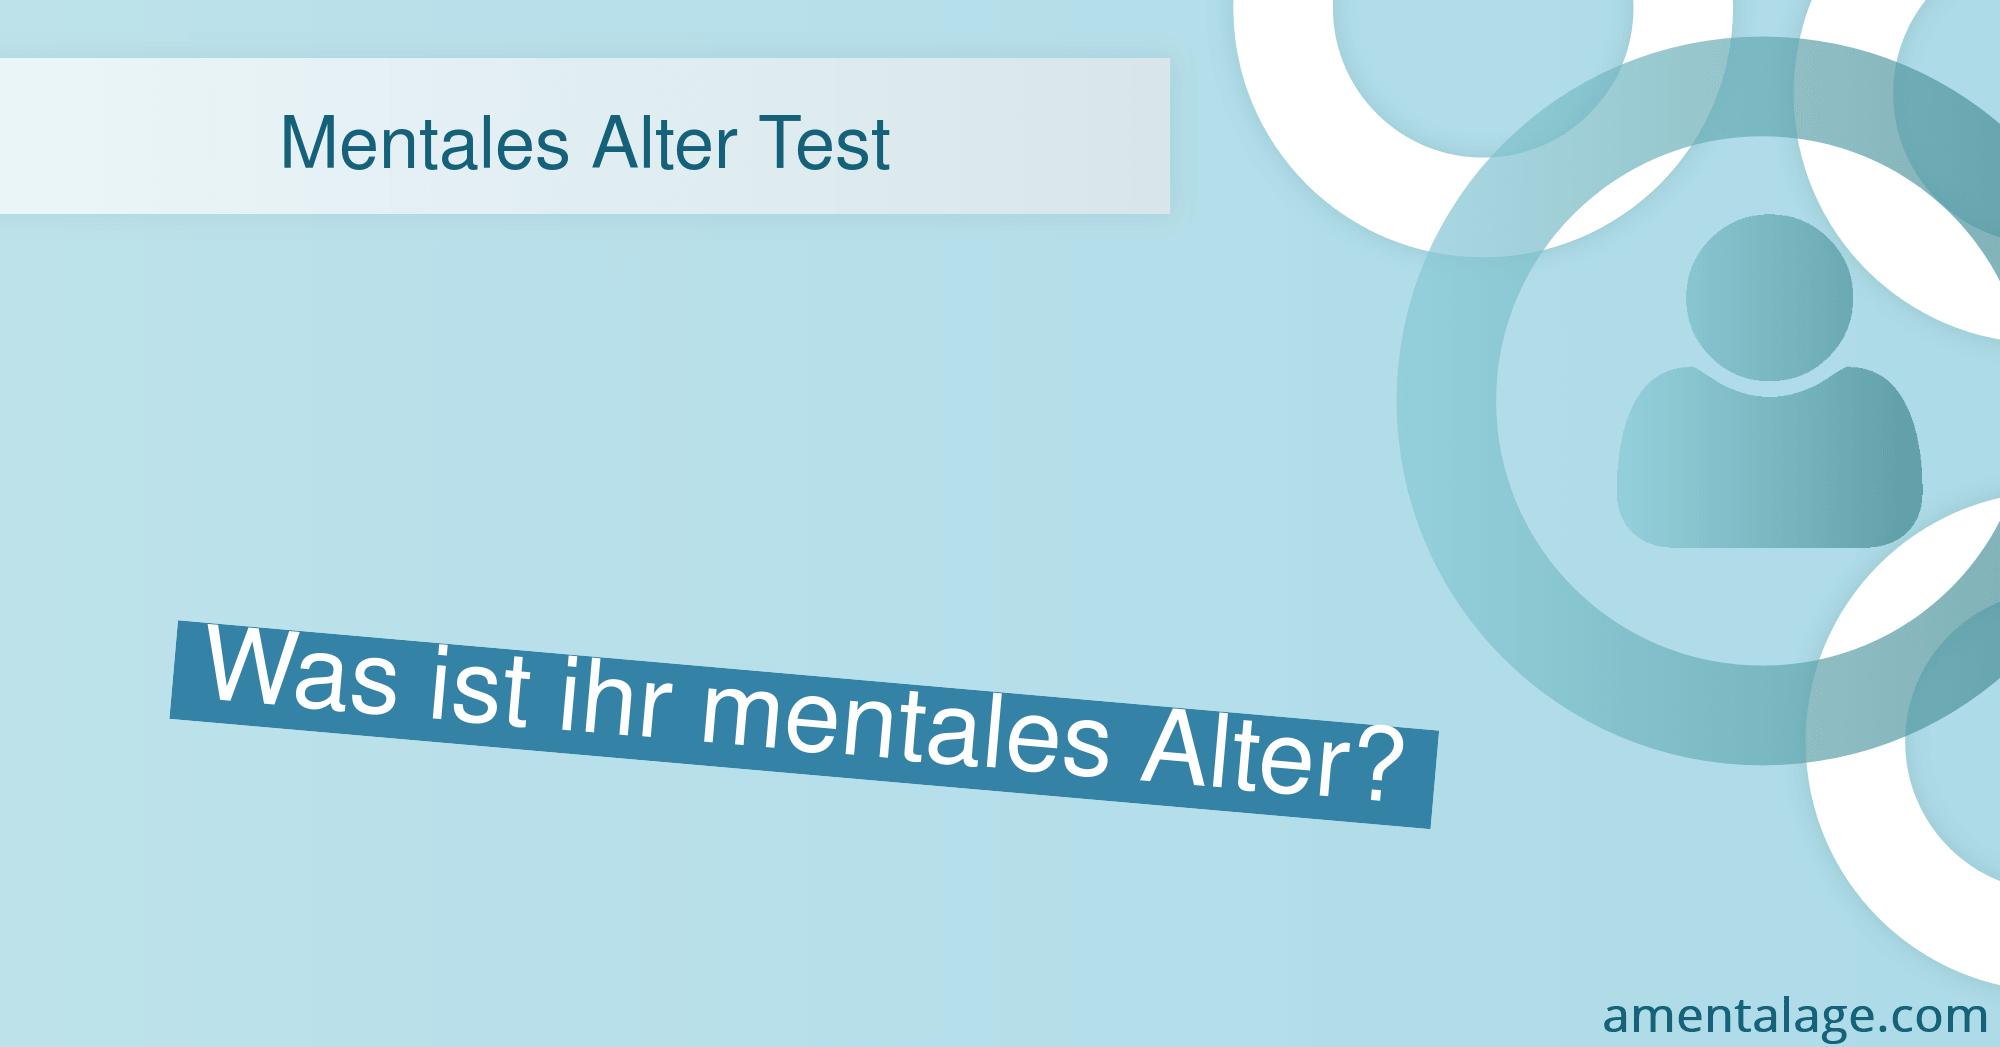 mentales alter test